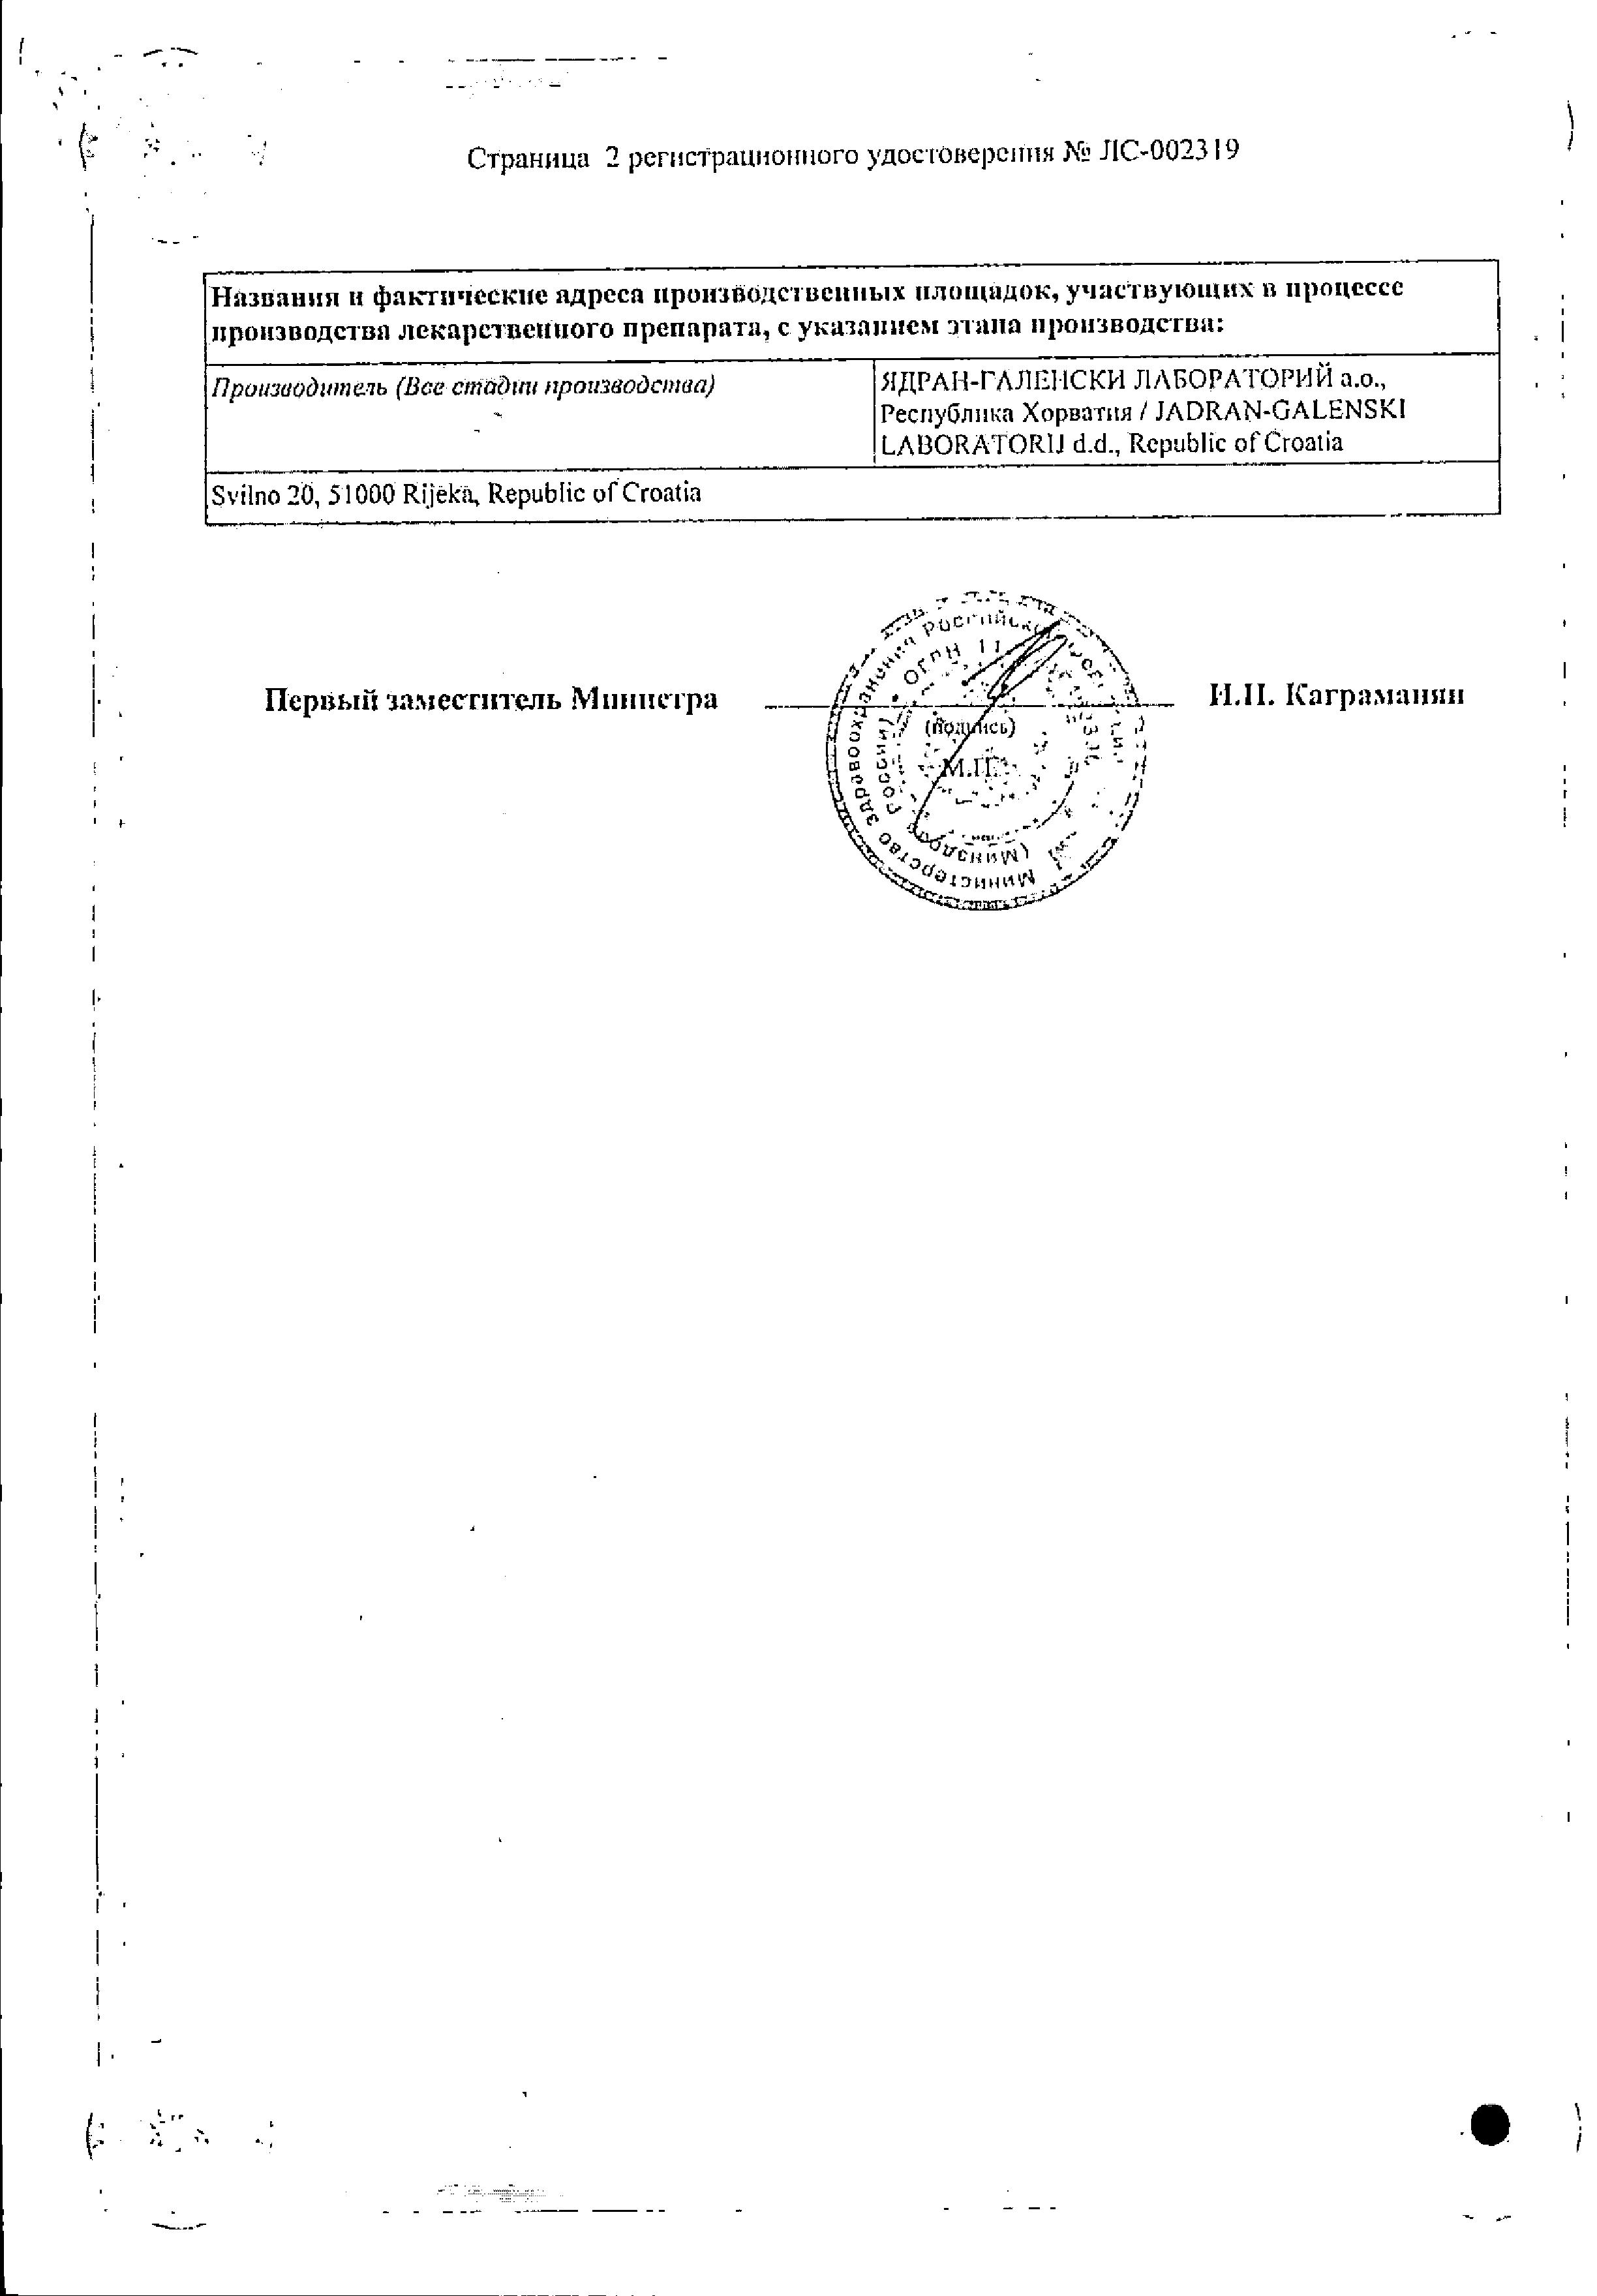 Аква Марис Стронг для горла сертификат